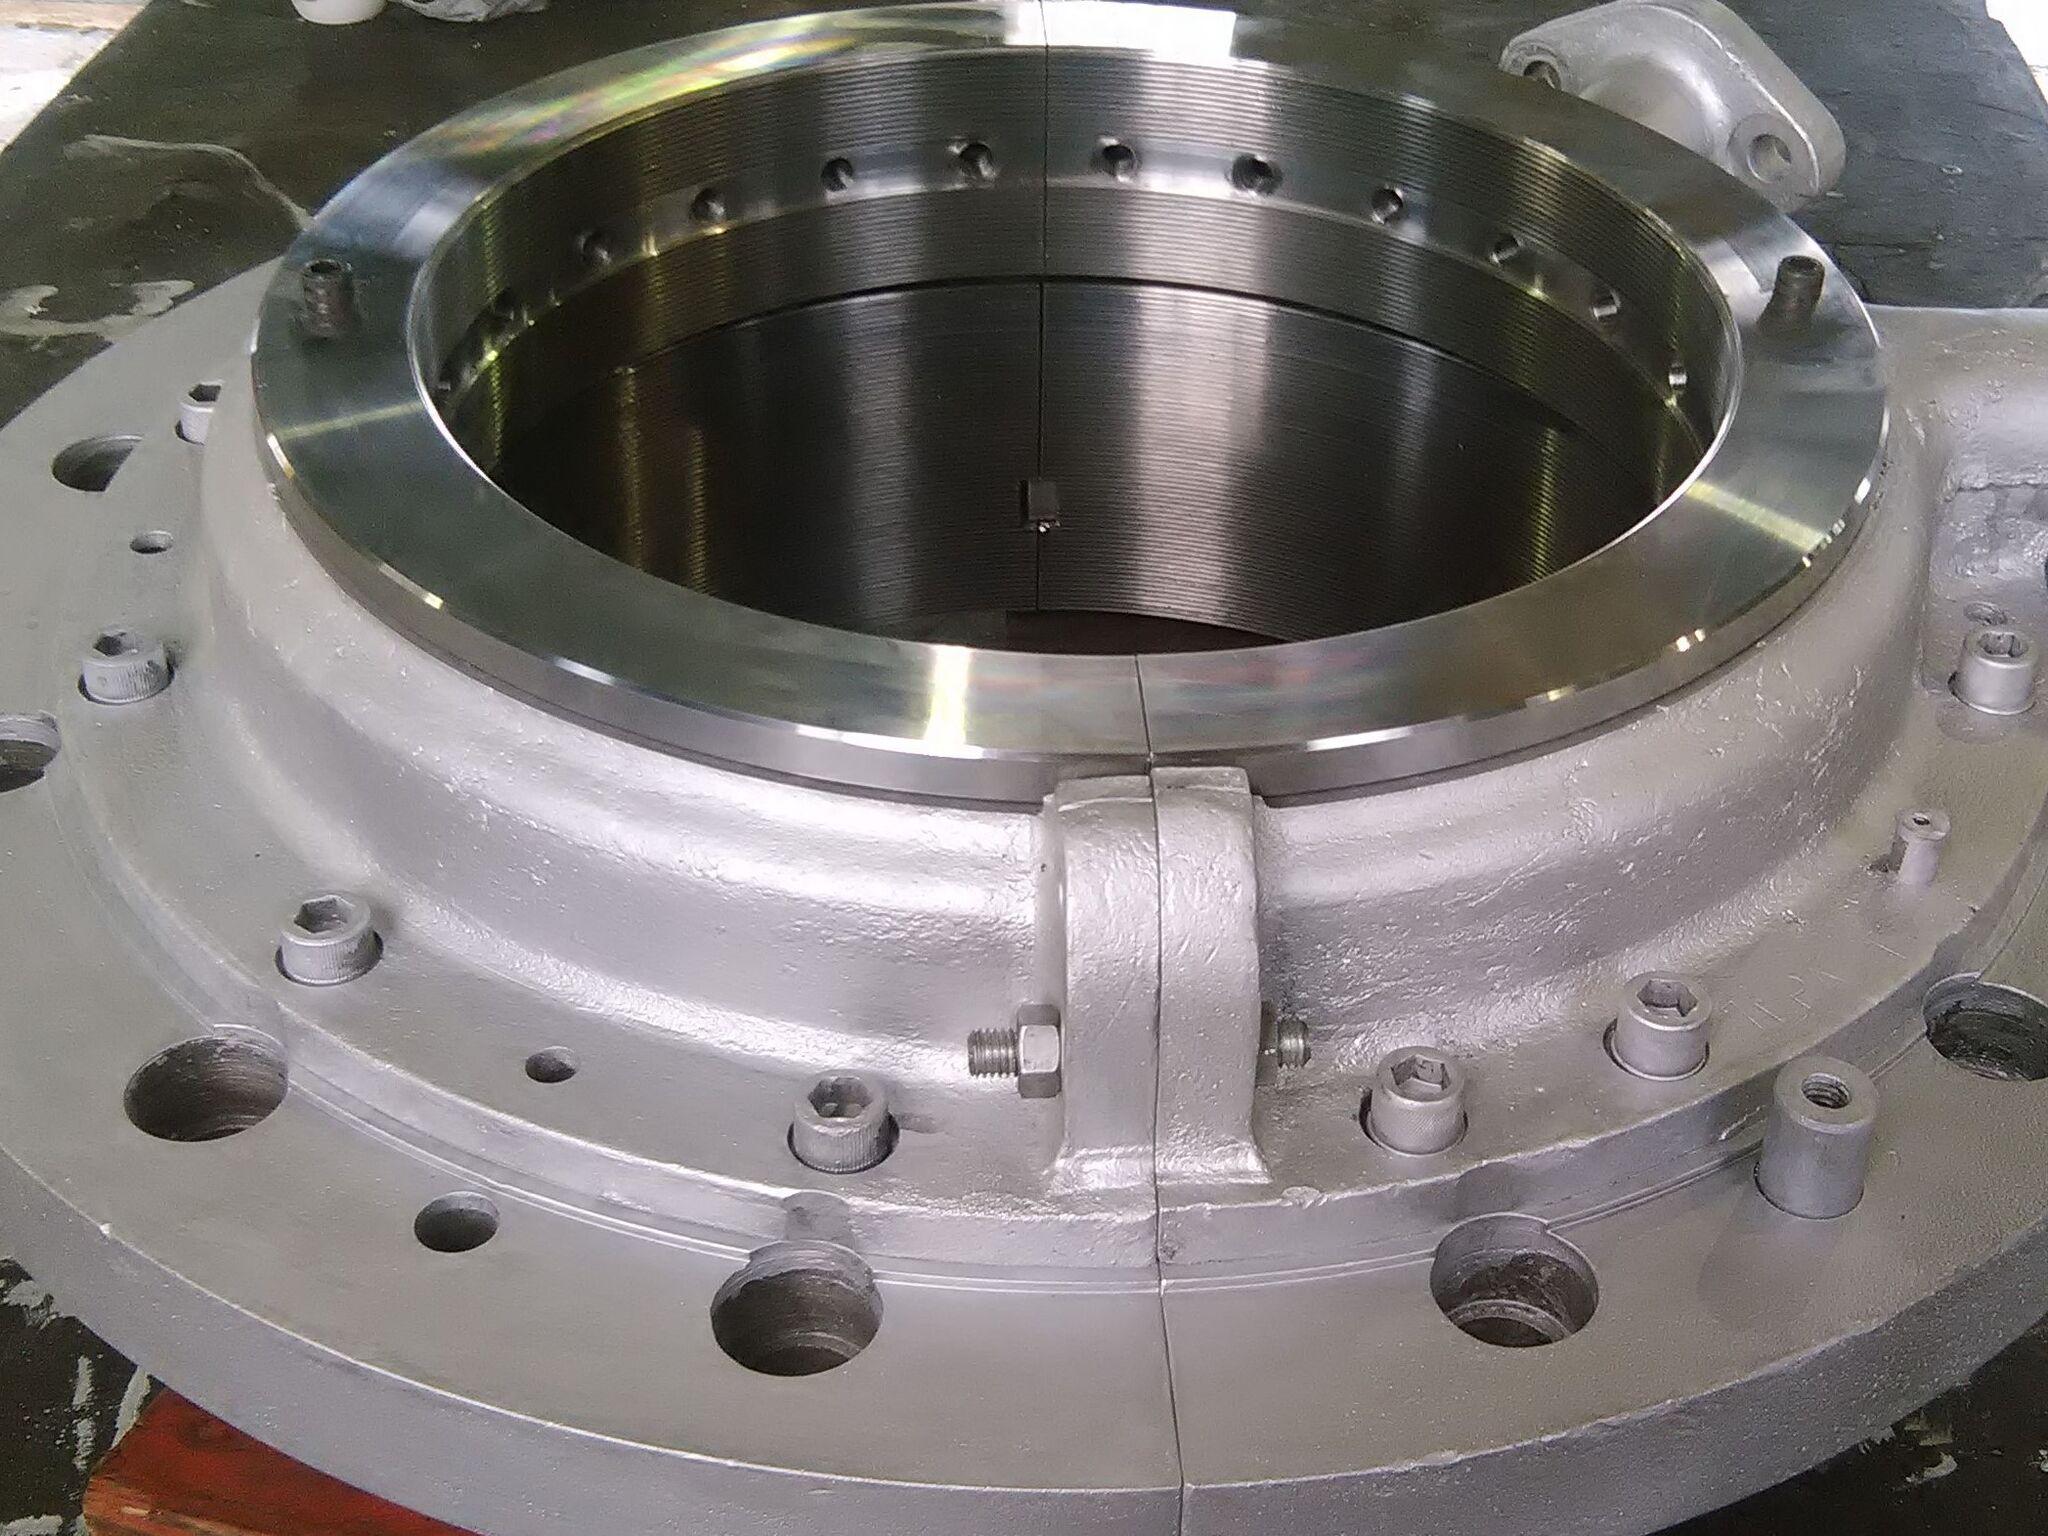 Machined and refurbished gland seal for turbine